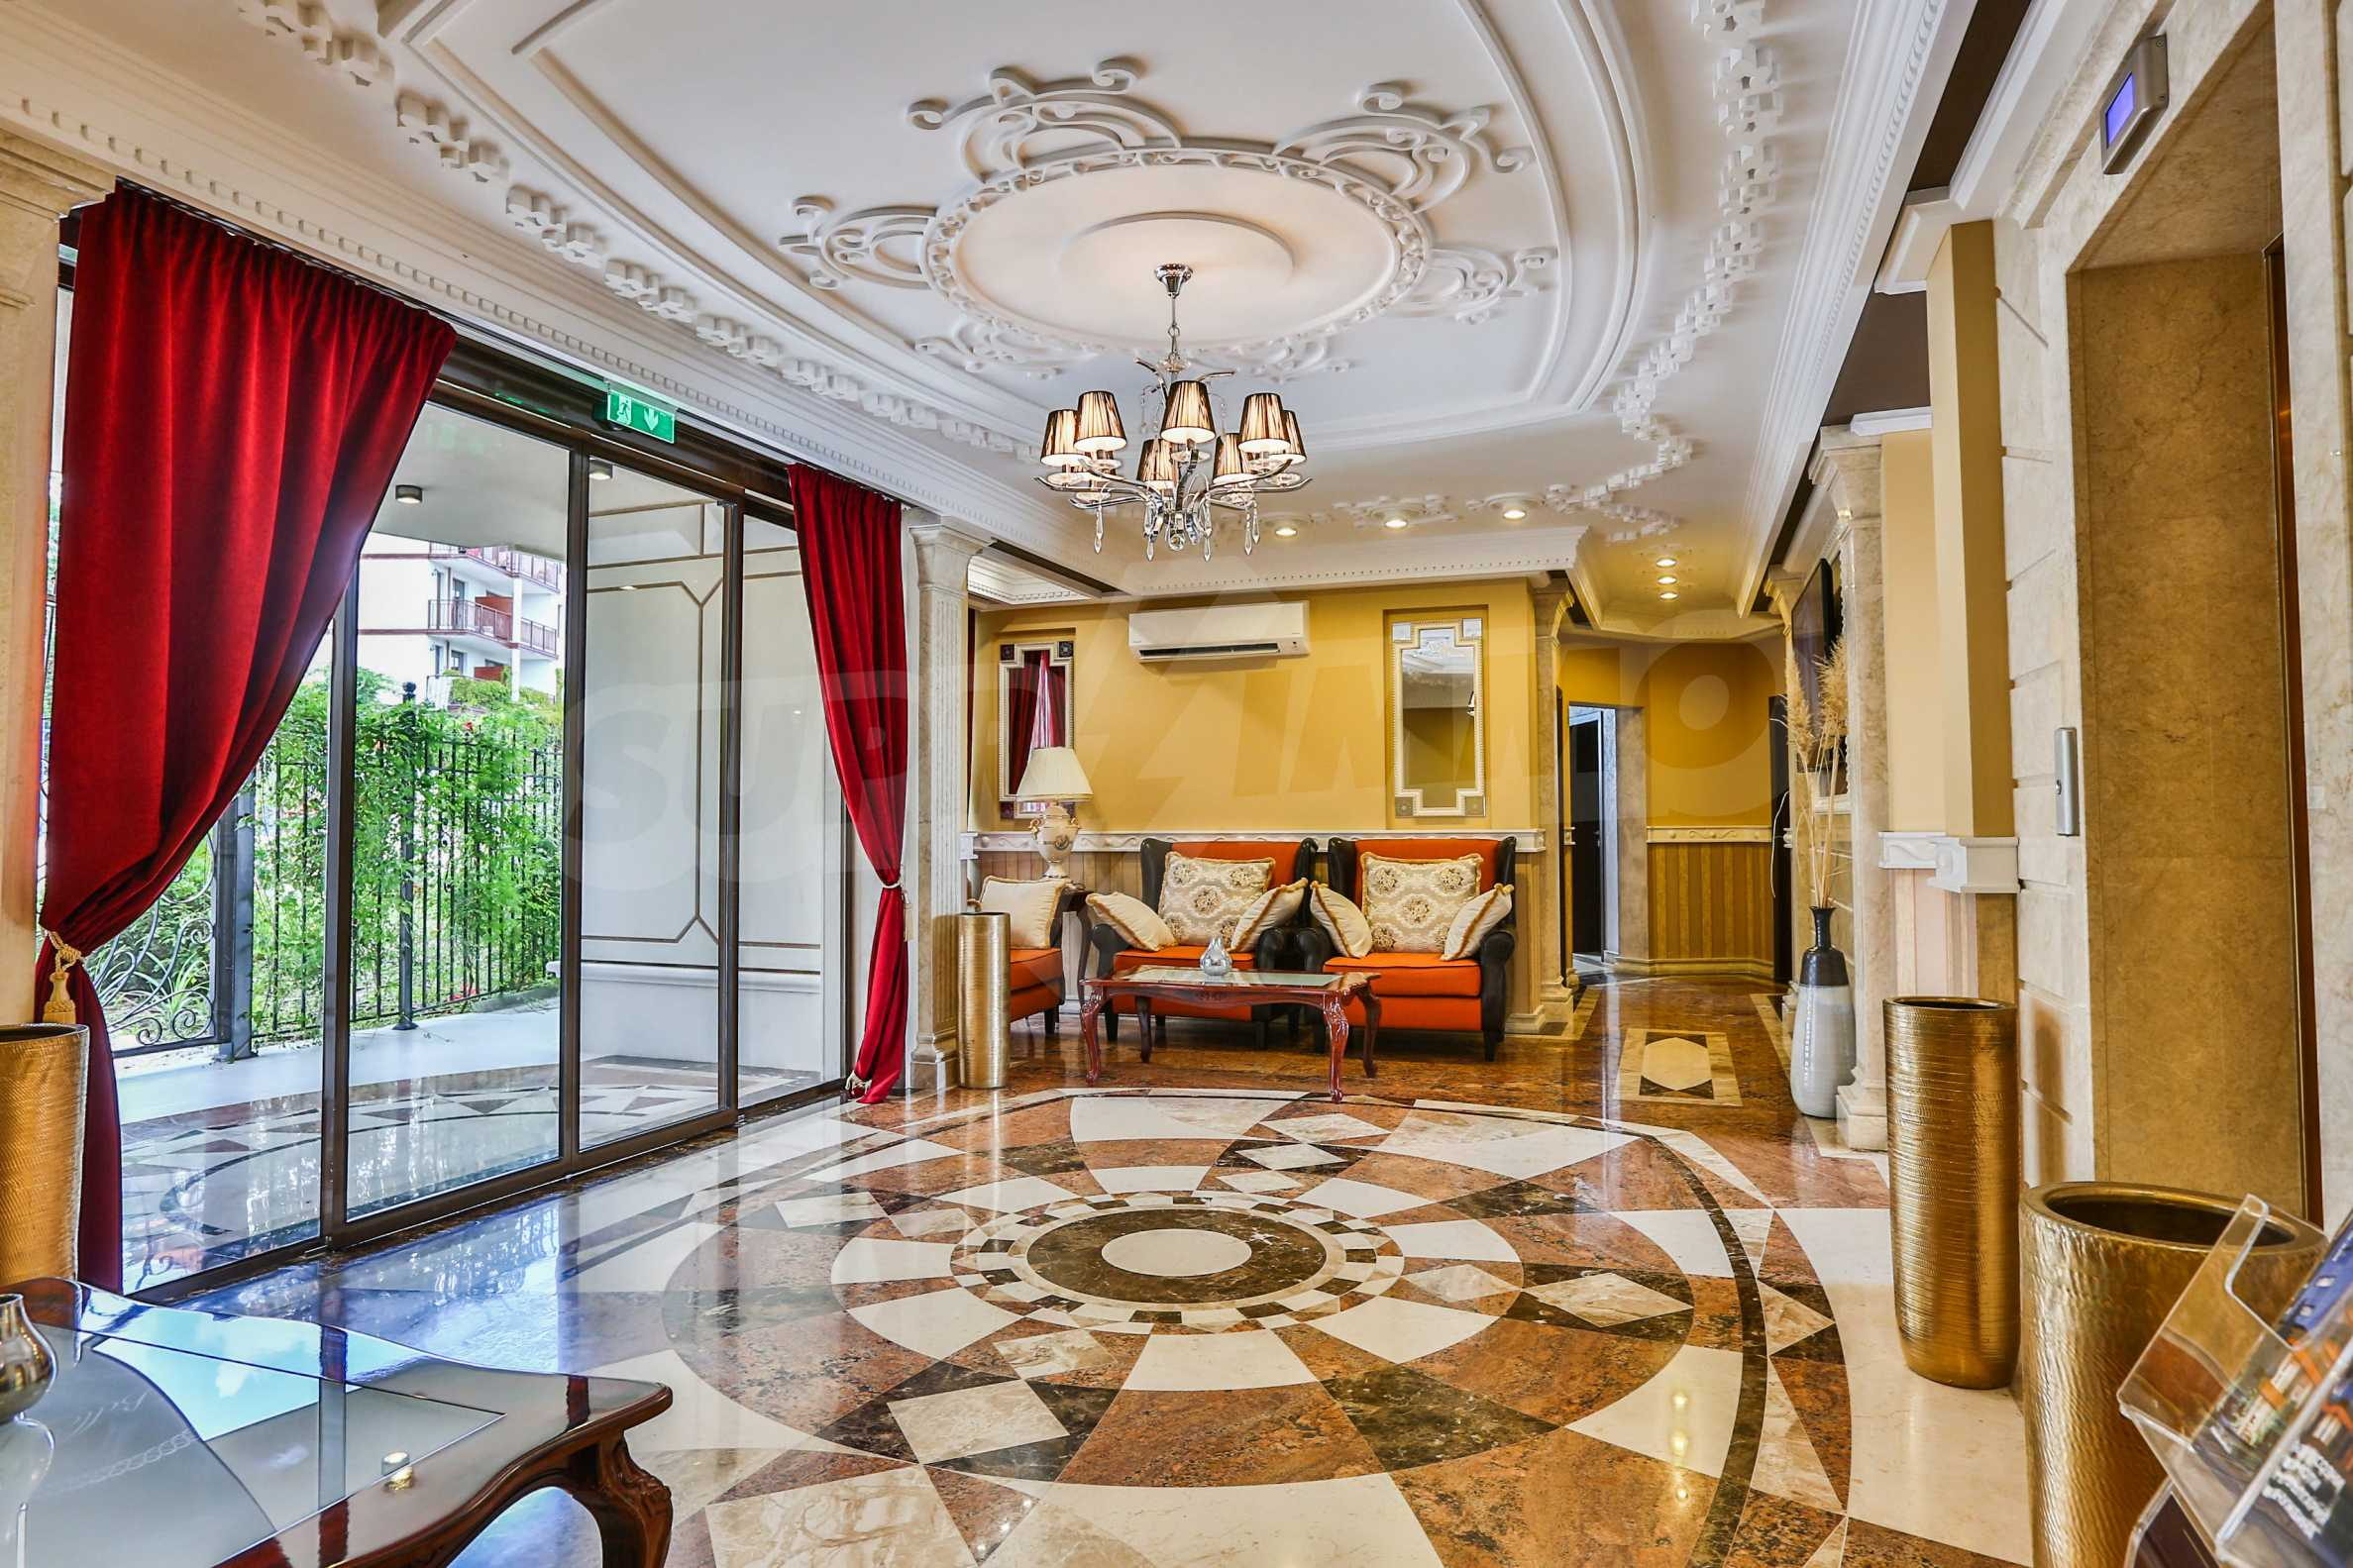 Дизайнерски тристаен апартамент под наем за летен сезон в резиденция Belle Époque в Лозенец 30